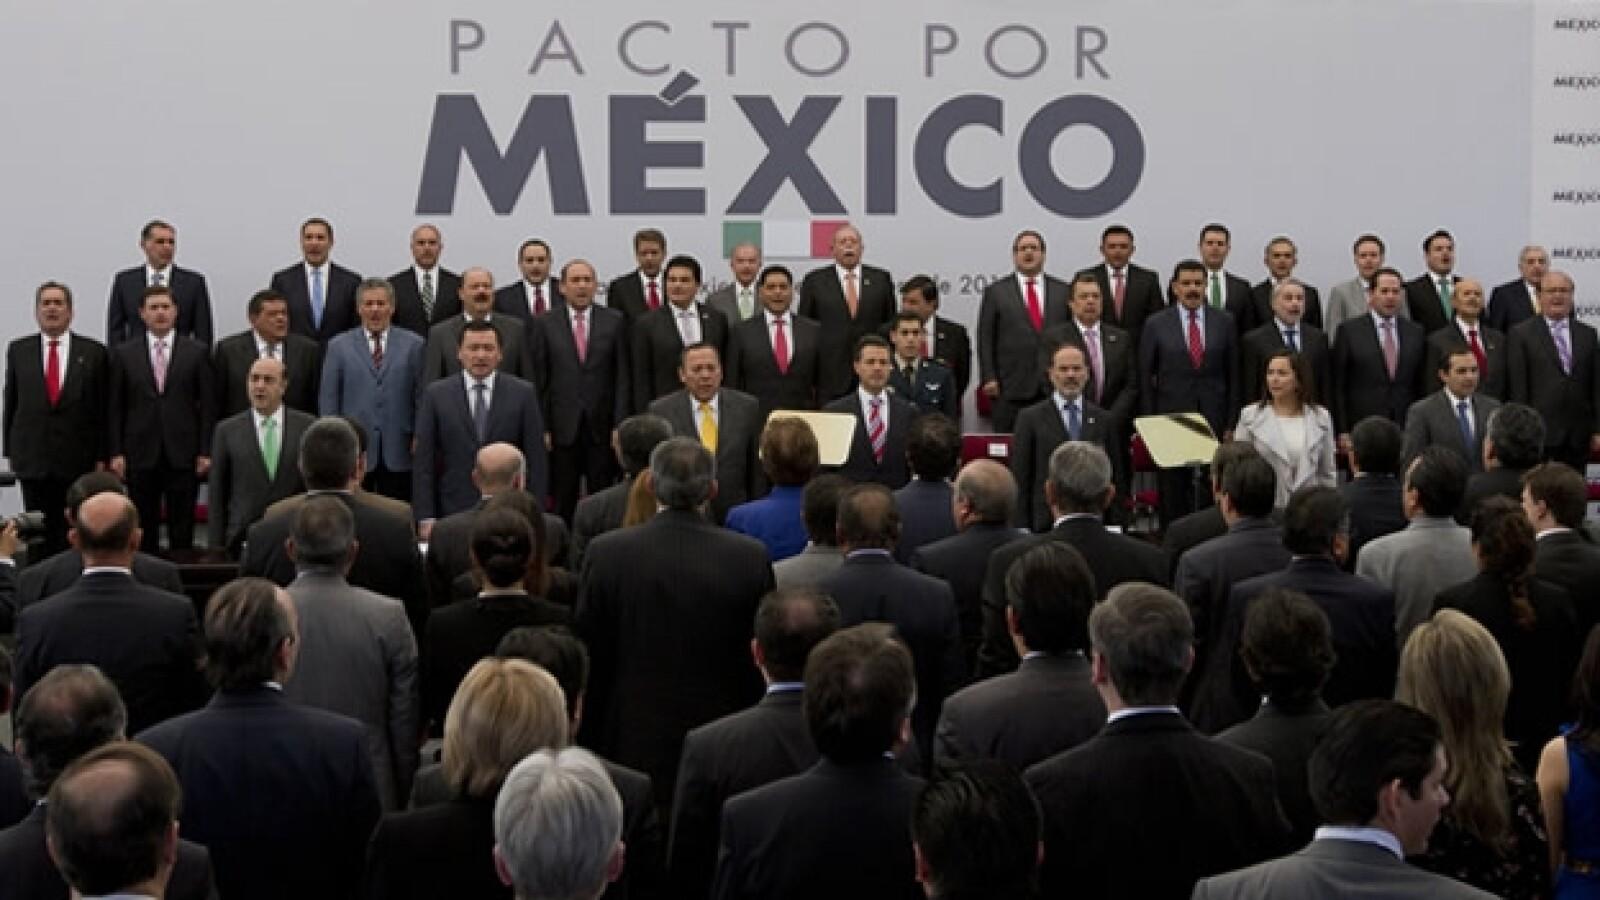 pacto_mexico_pri